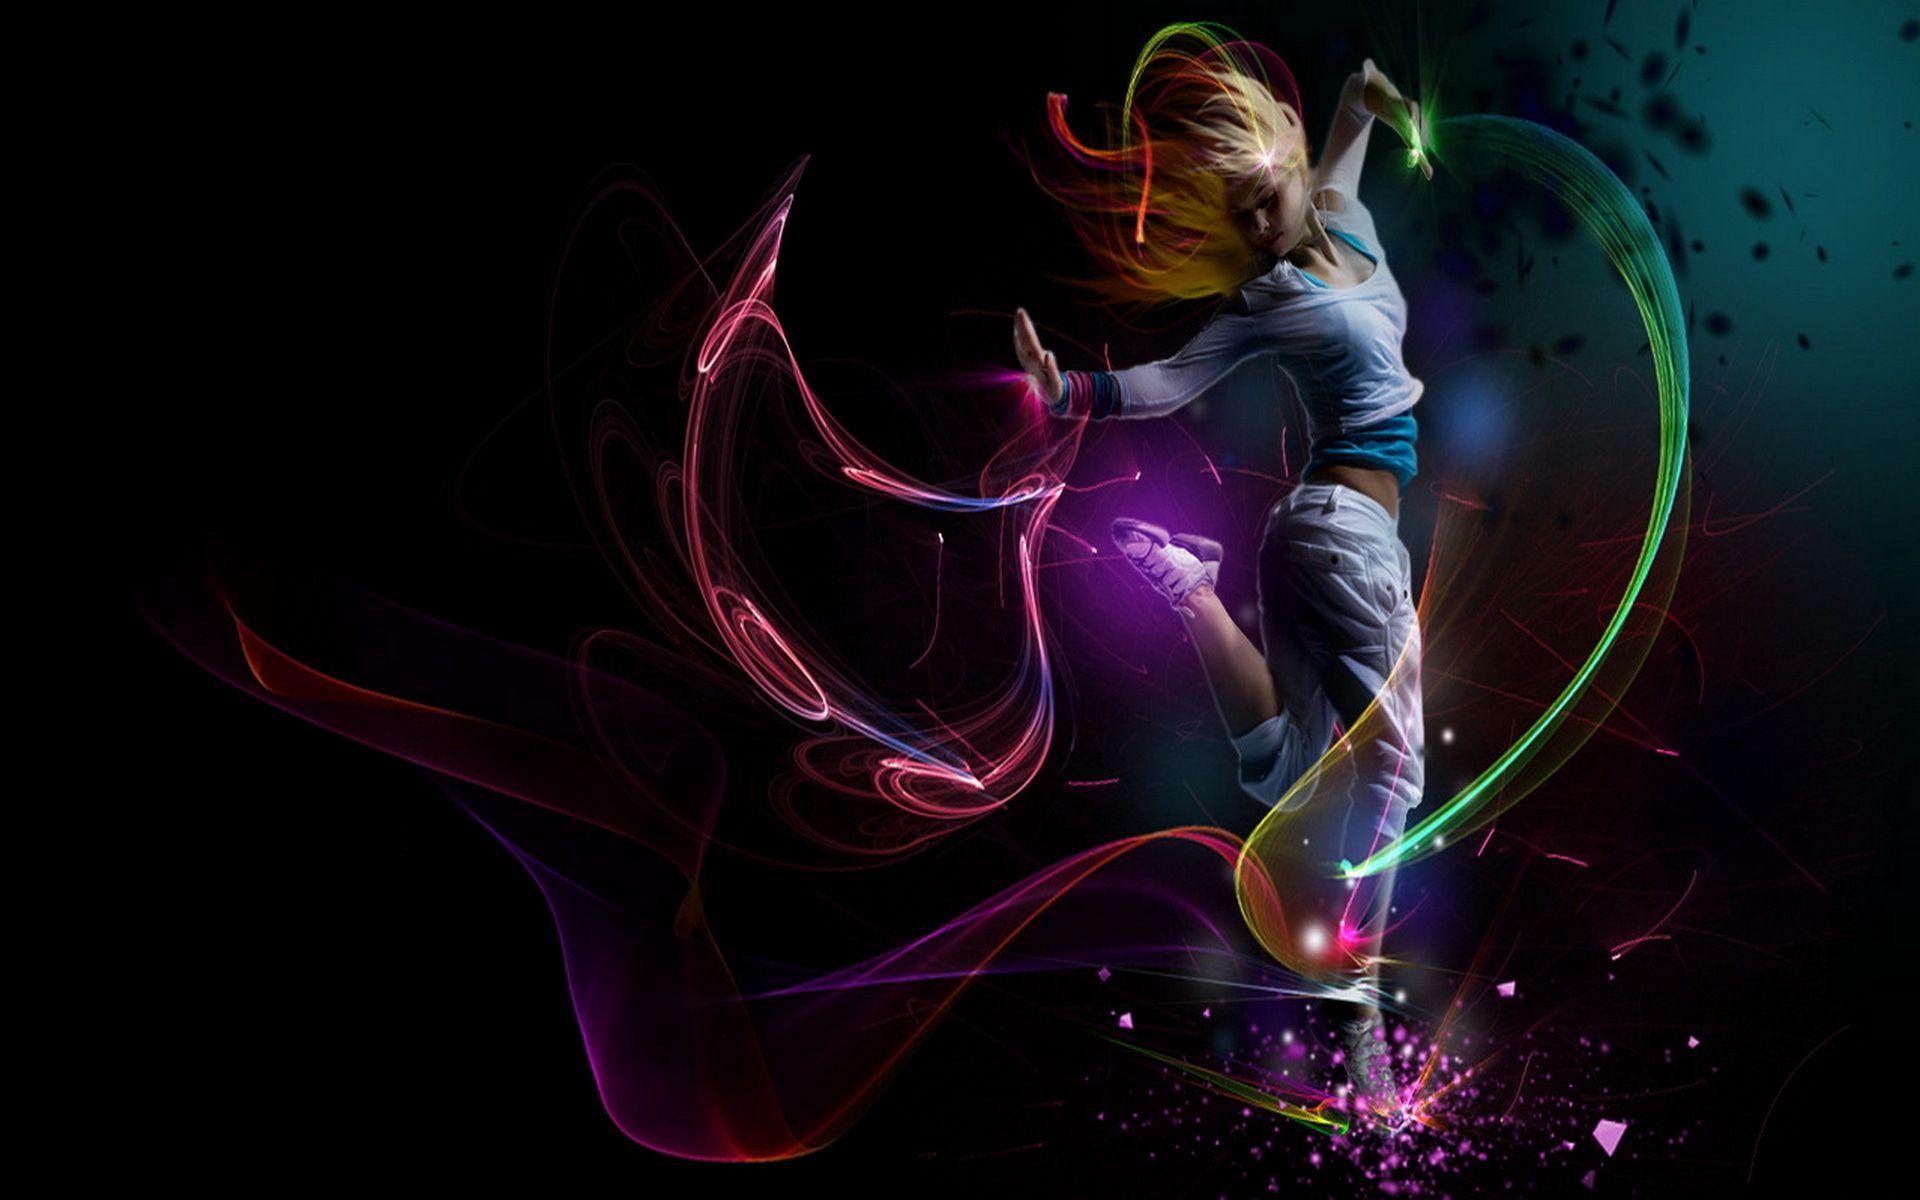 dancing to the beat | girls wallpapers | pinterest | dancing, girl